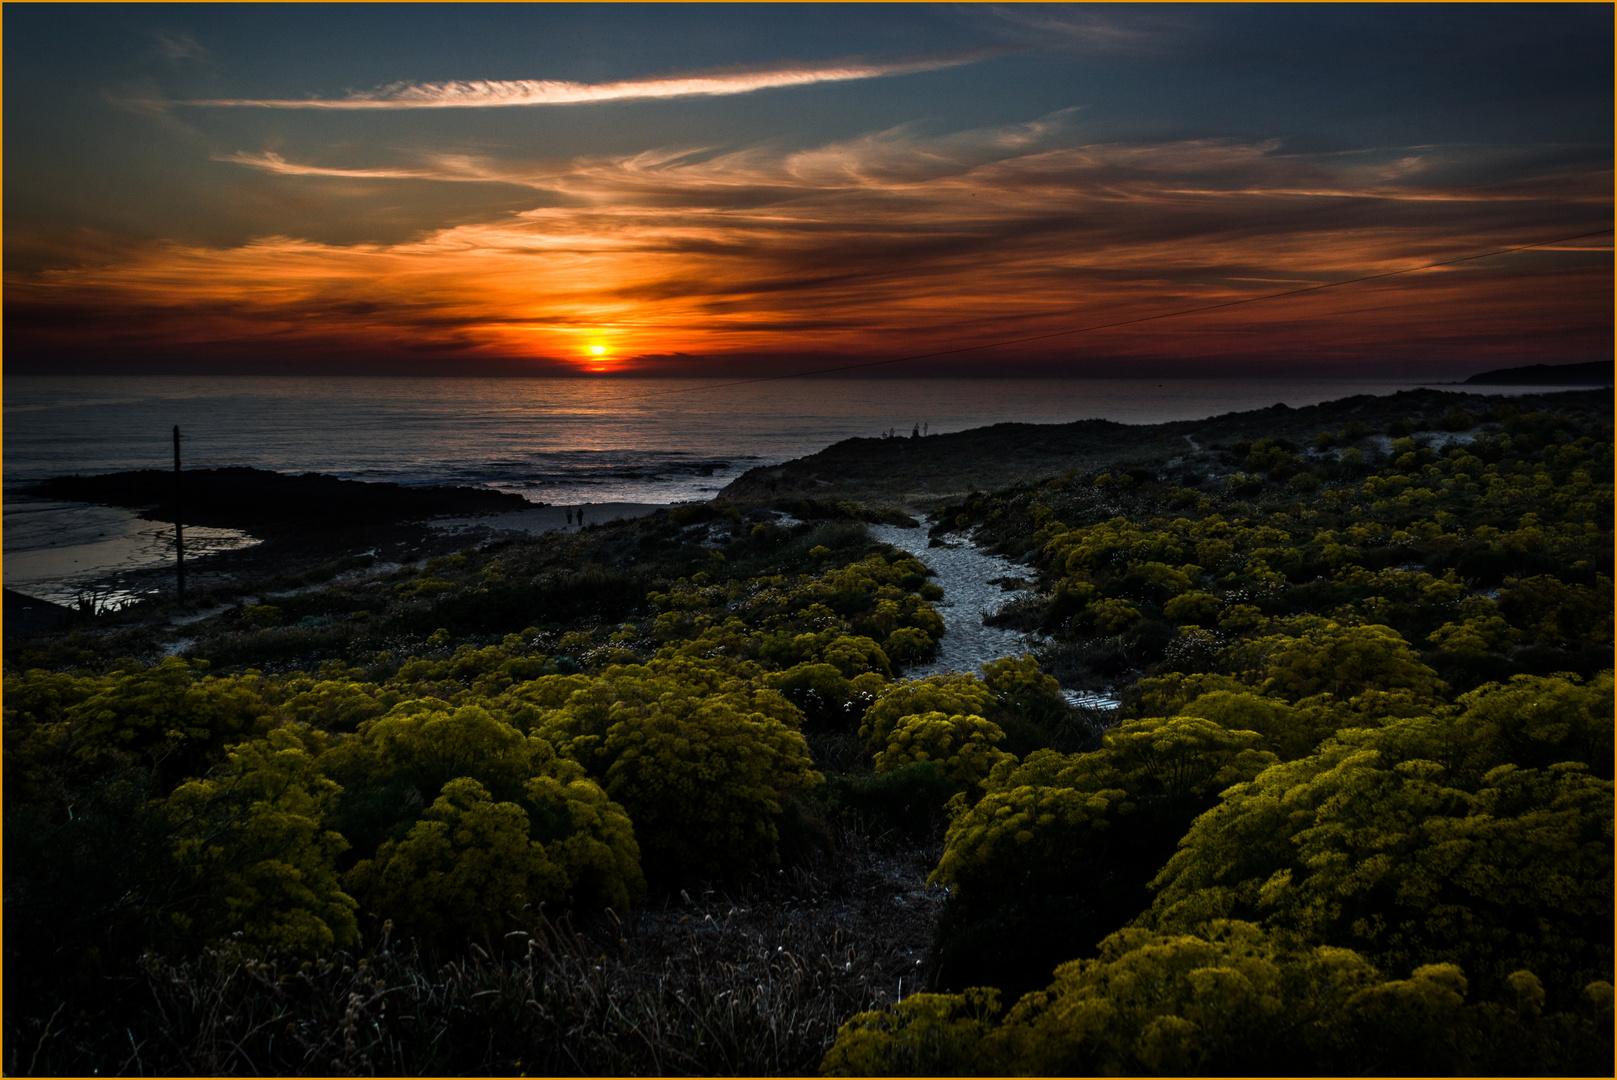 sunset - vila nova de milfontes